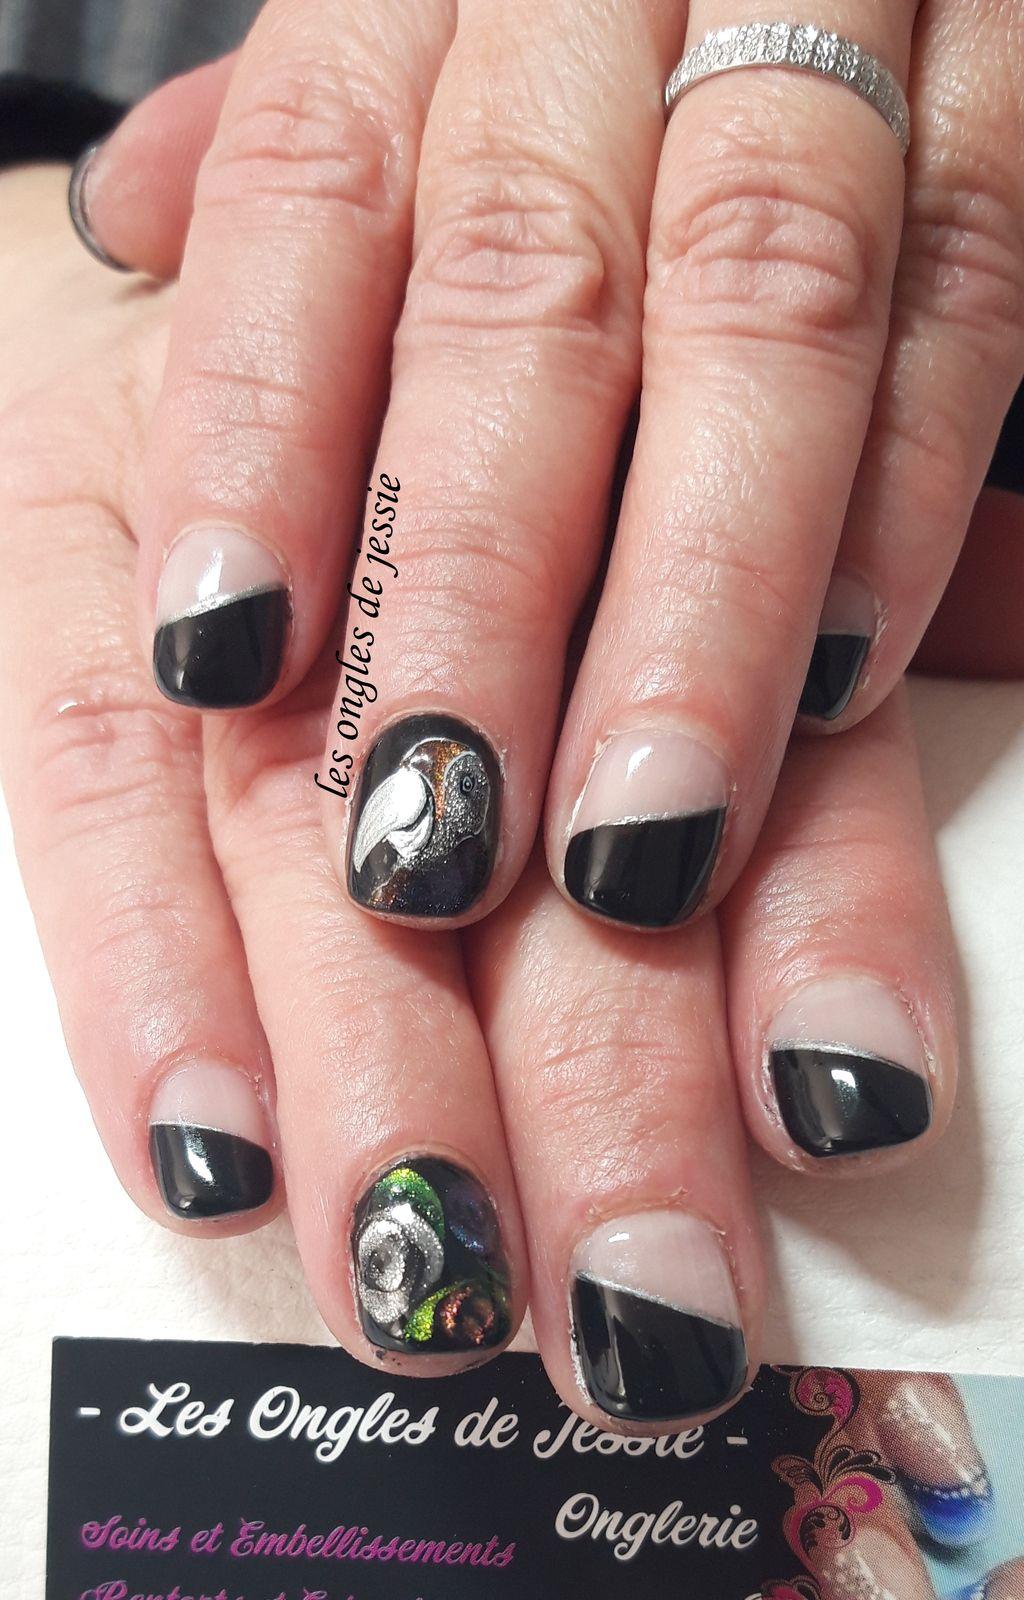 french biais noire nailart perroquet